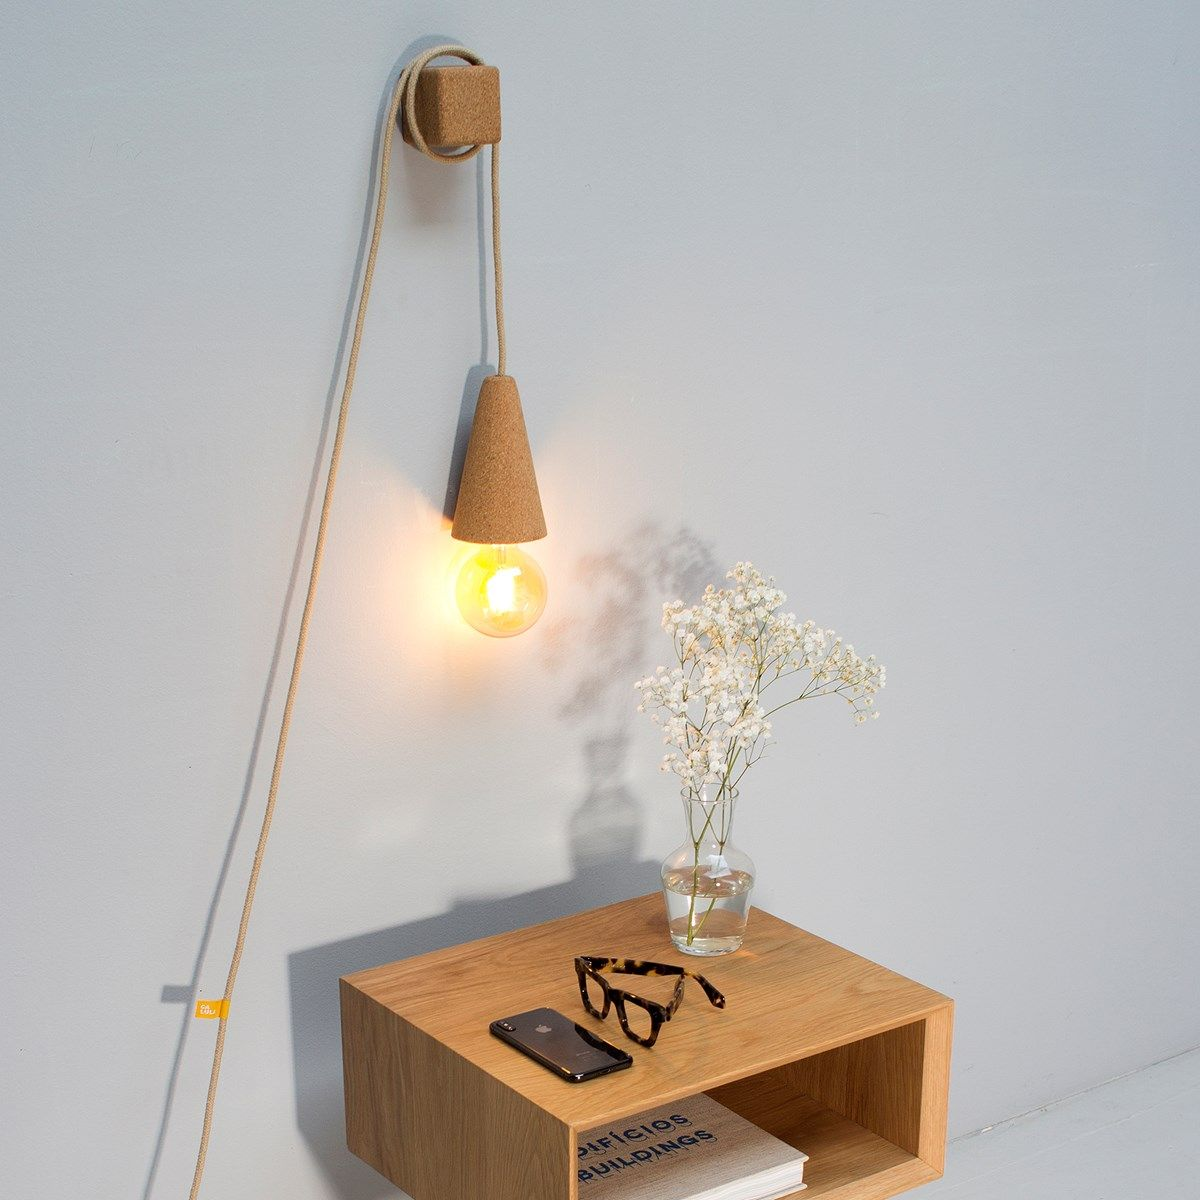 Lampe Baladeuse Sino Pose Liege Clair Et Cable Beige Lampes De Table Lampe A Poser Design Lampe Design